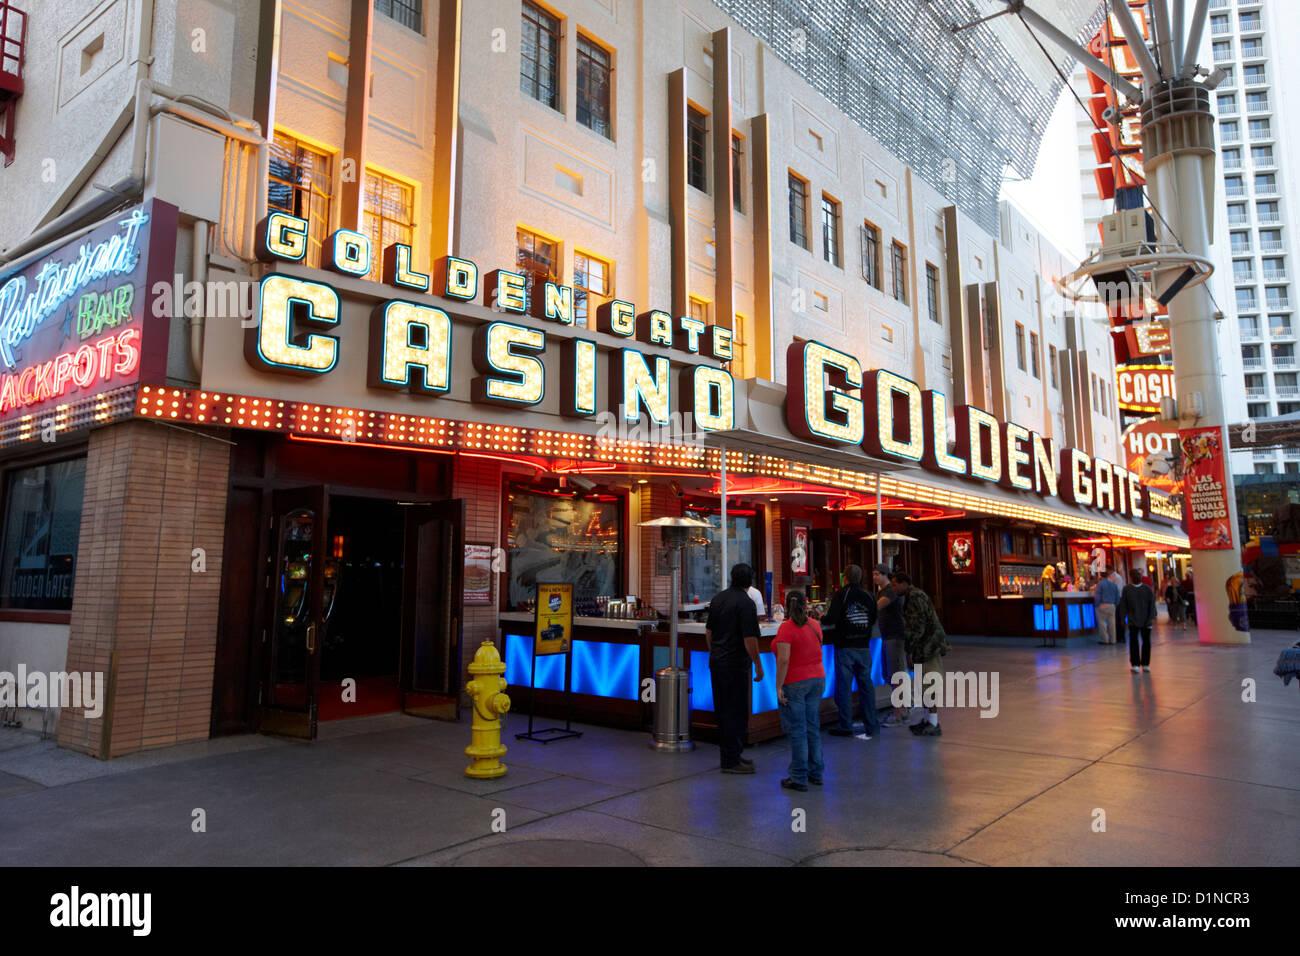 Golden Gate Casino Hotel Las Vegas Nv Usa